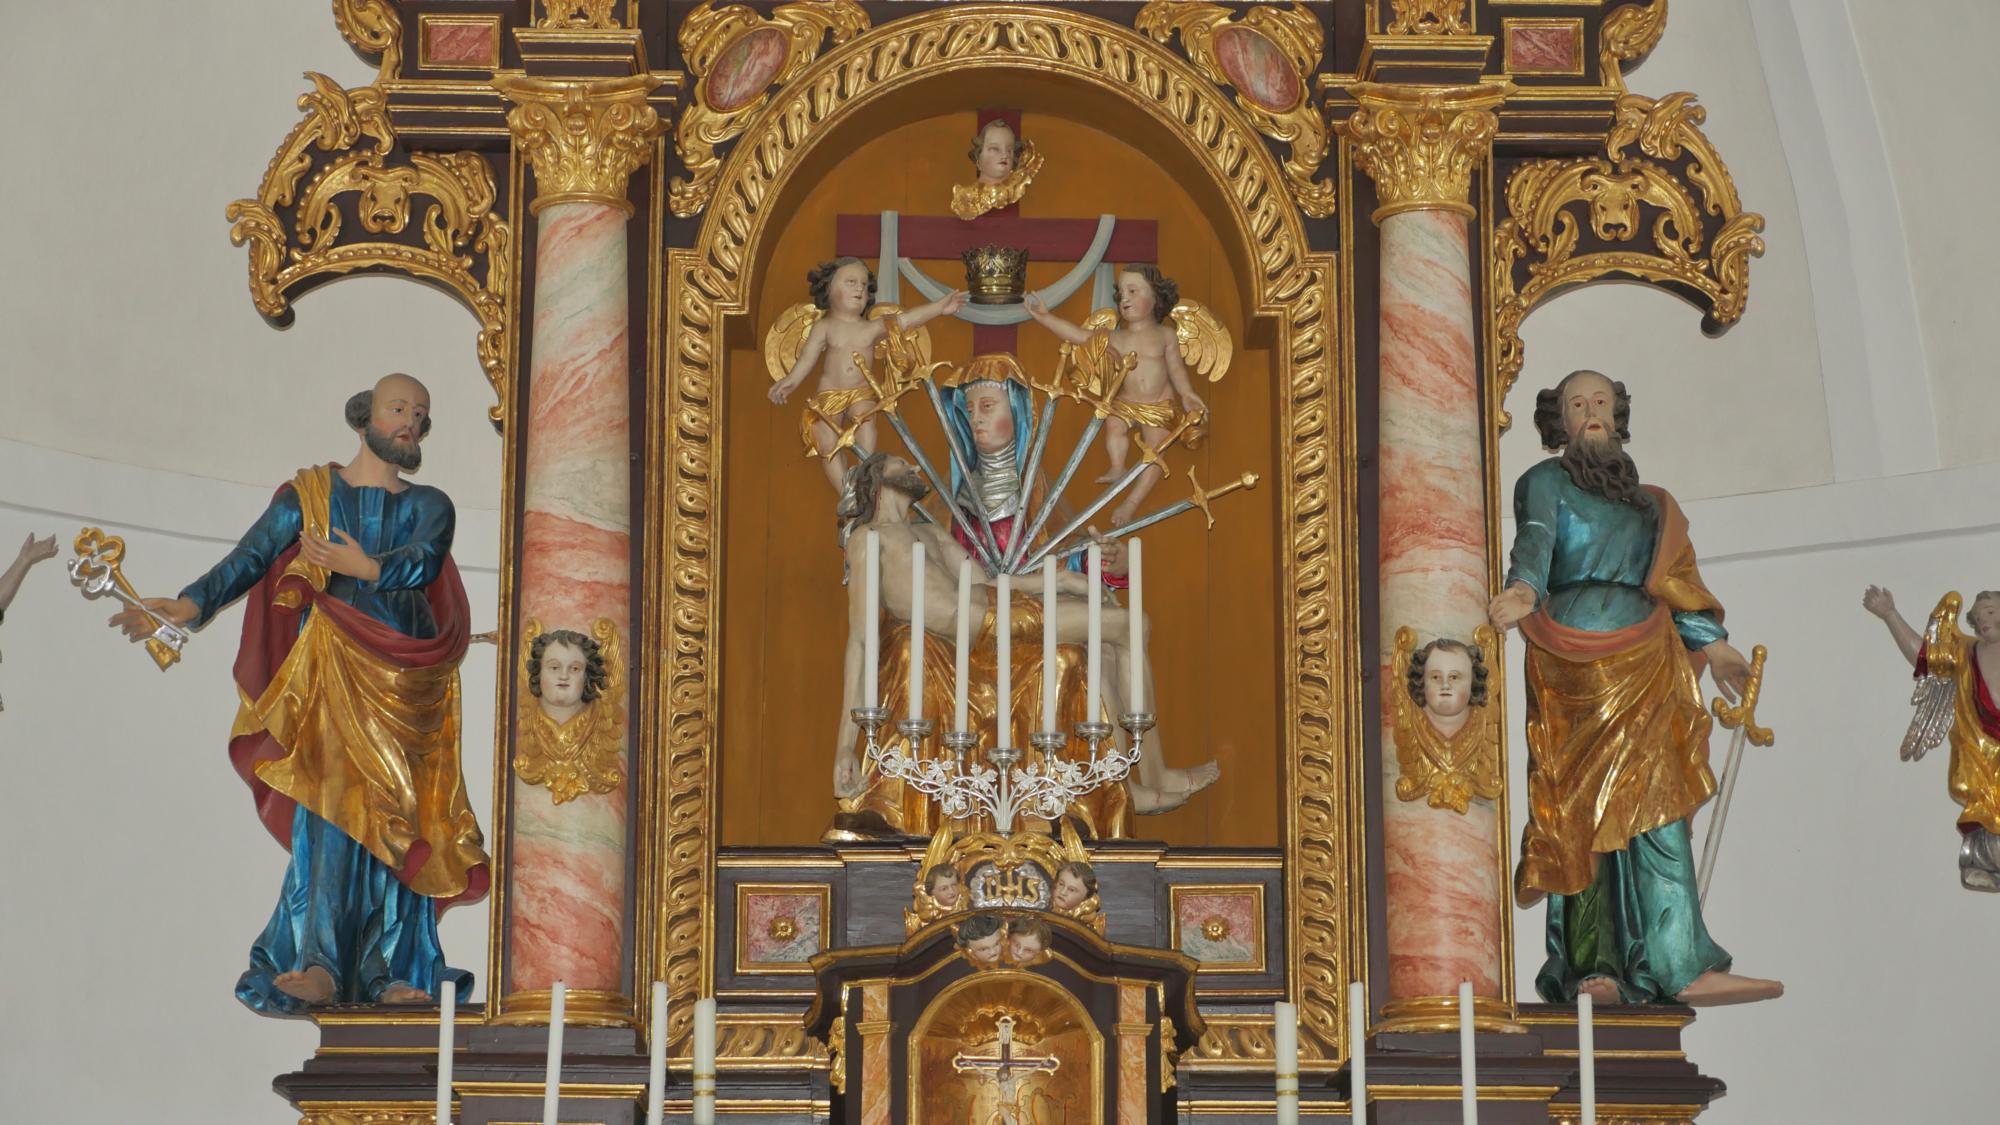 2021 04 26 aoelfb wallfahrtskirche mariae himmelfahrt atzberg4